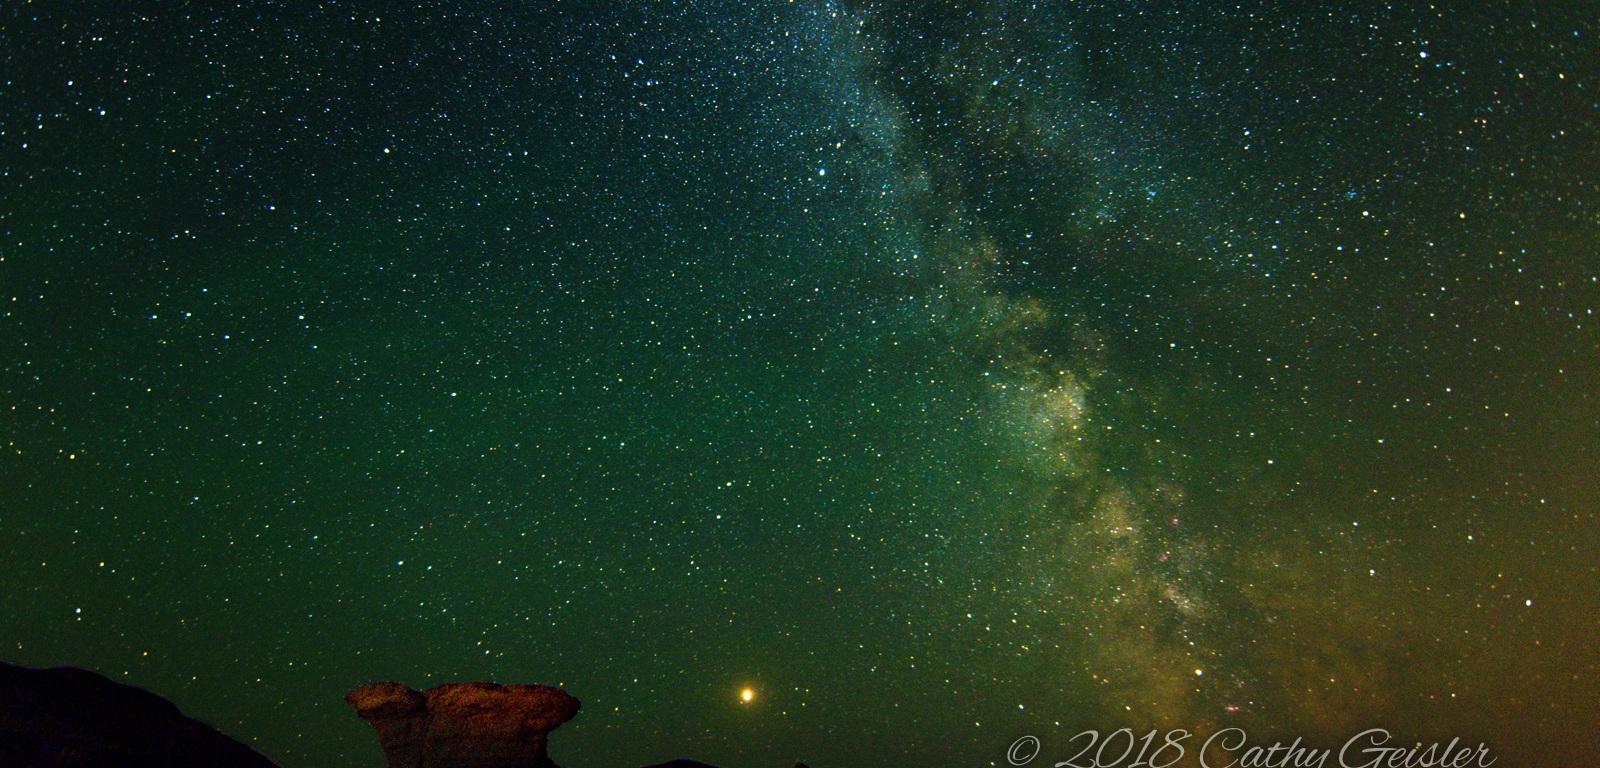 Avonlea Badlands - Hoodoo, Mars and Milky Way